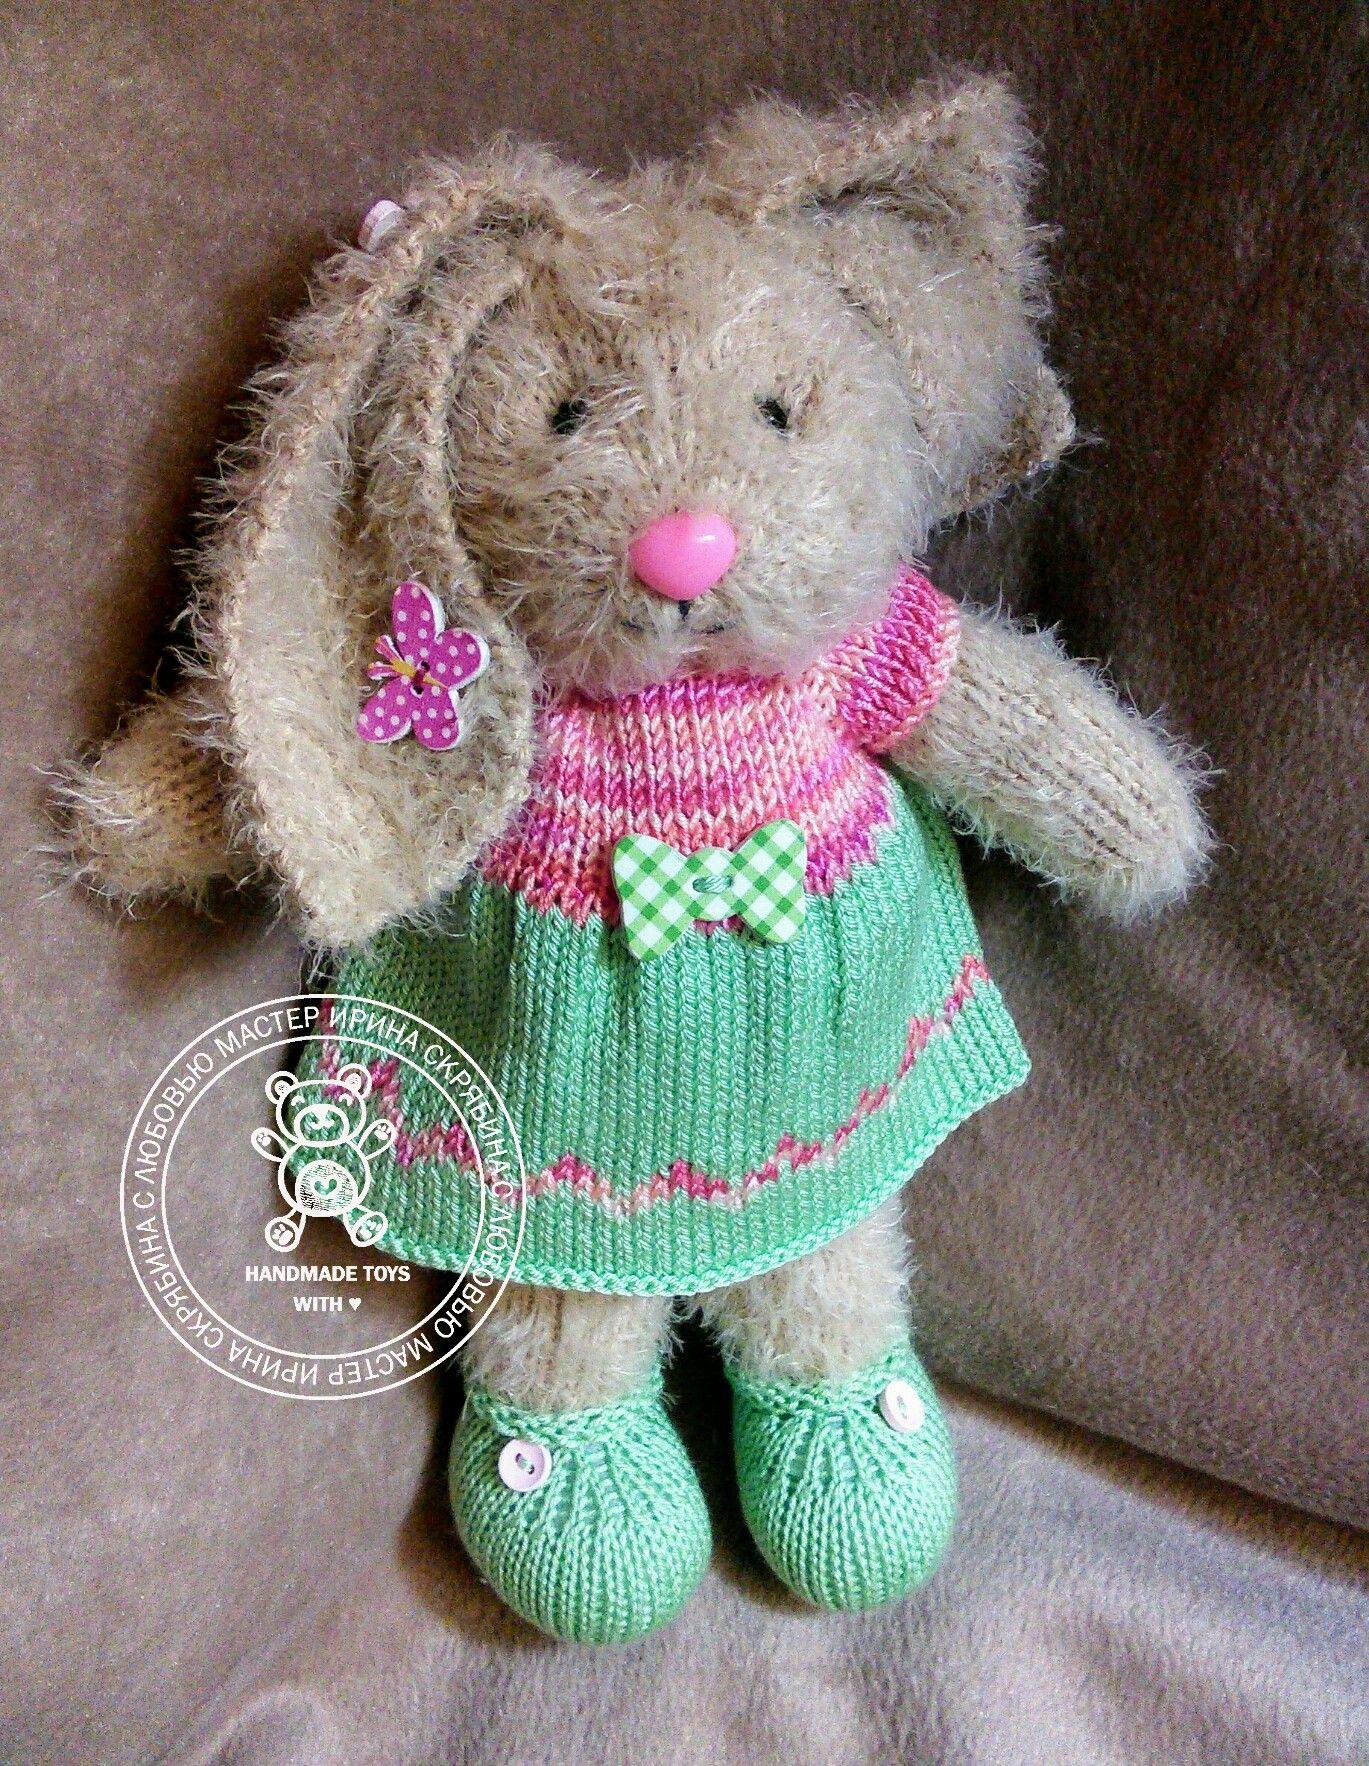 Pin by Tammy Marro on Knitted animals & dolls | Pinterest | Rabbit ...